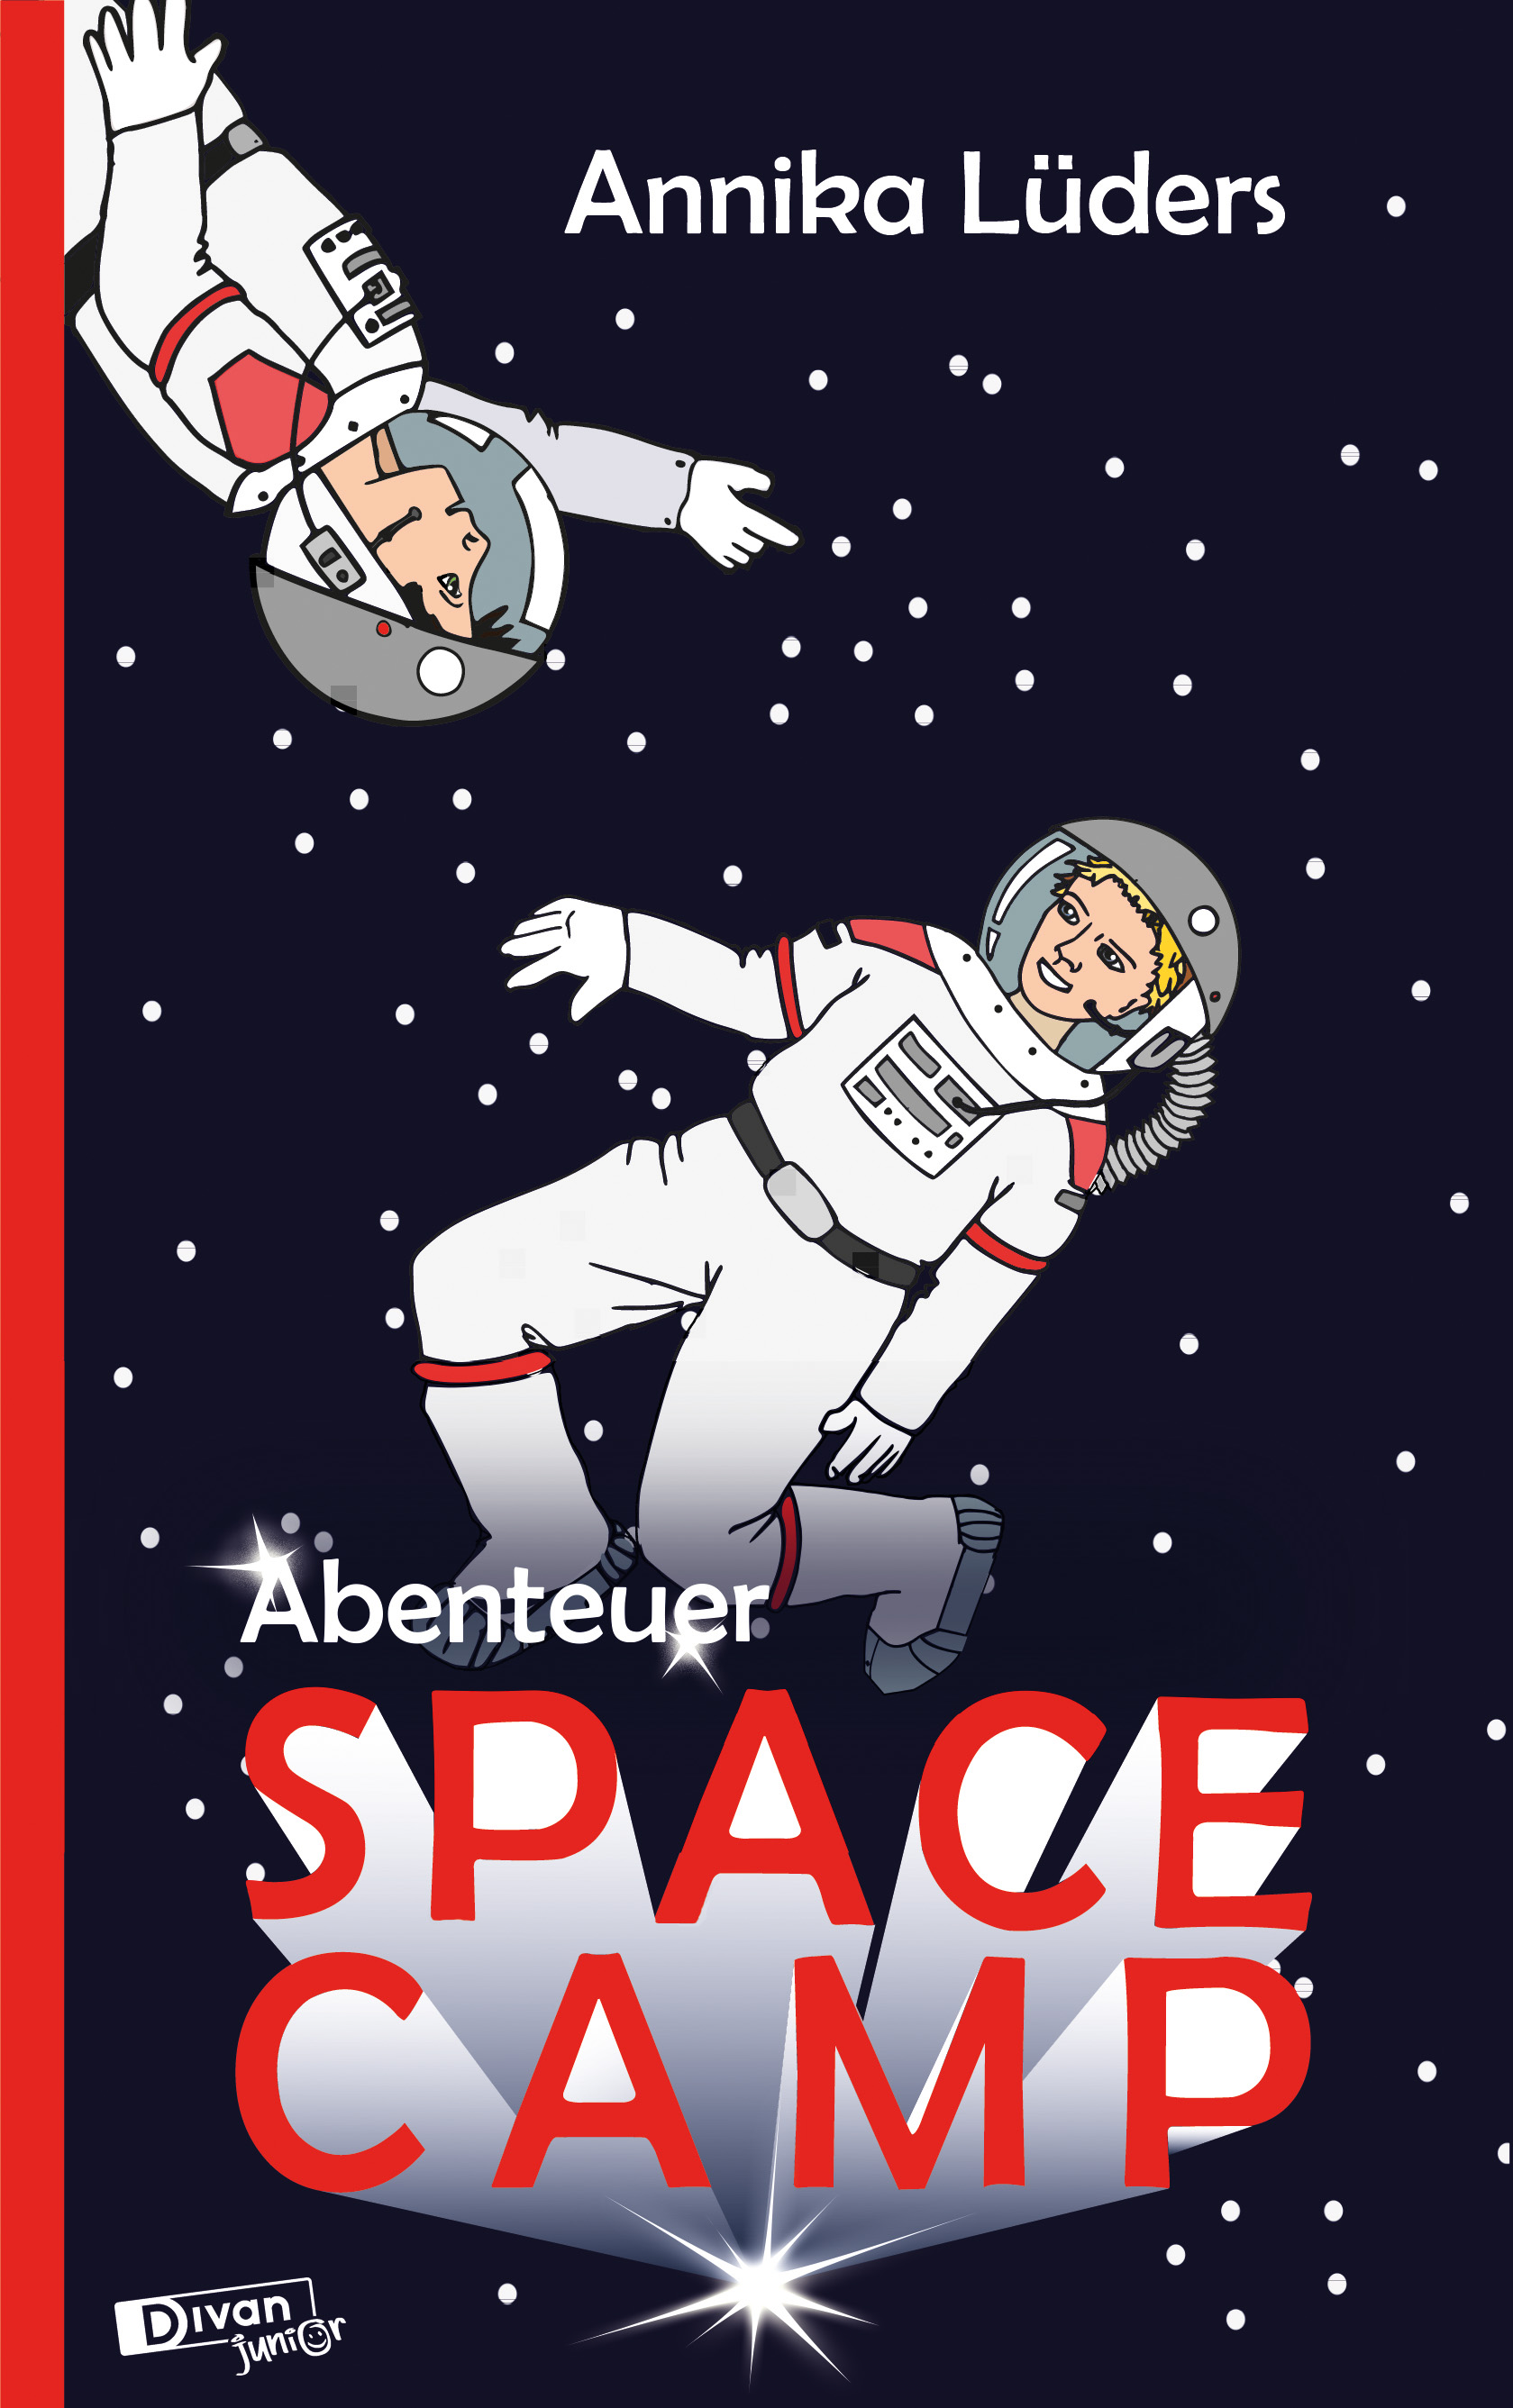 Abenteuer Space Camp (Annika Lüders)